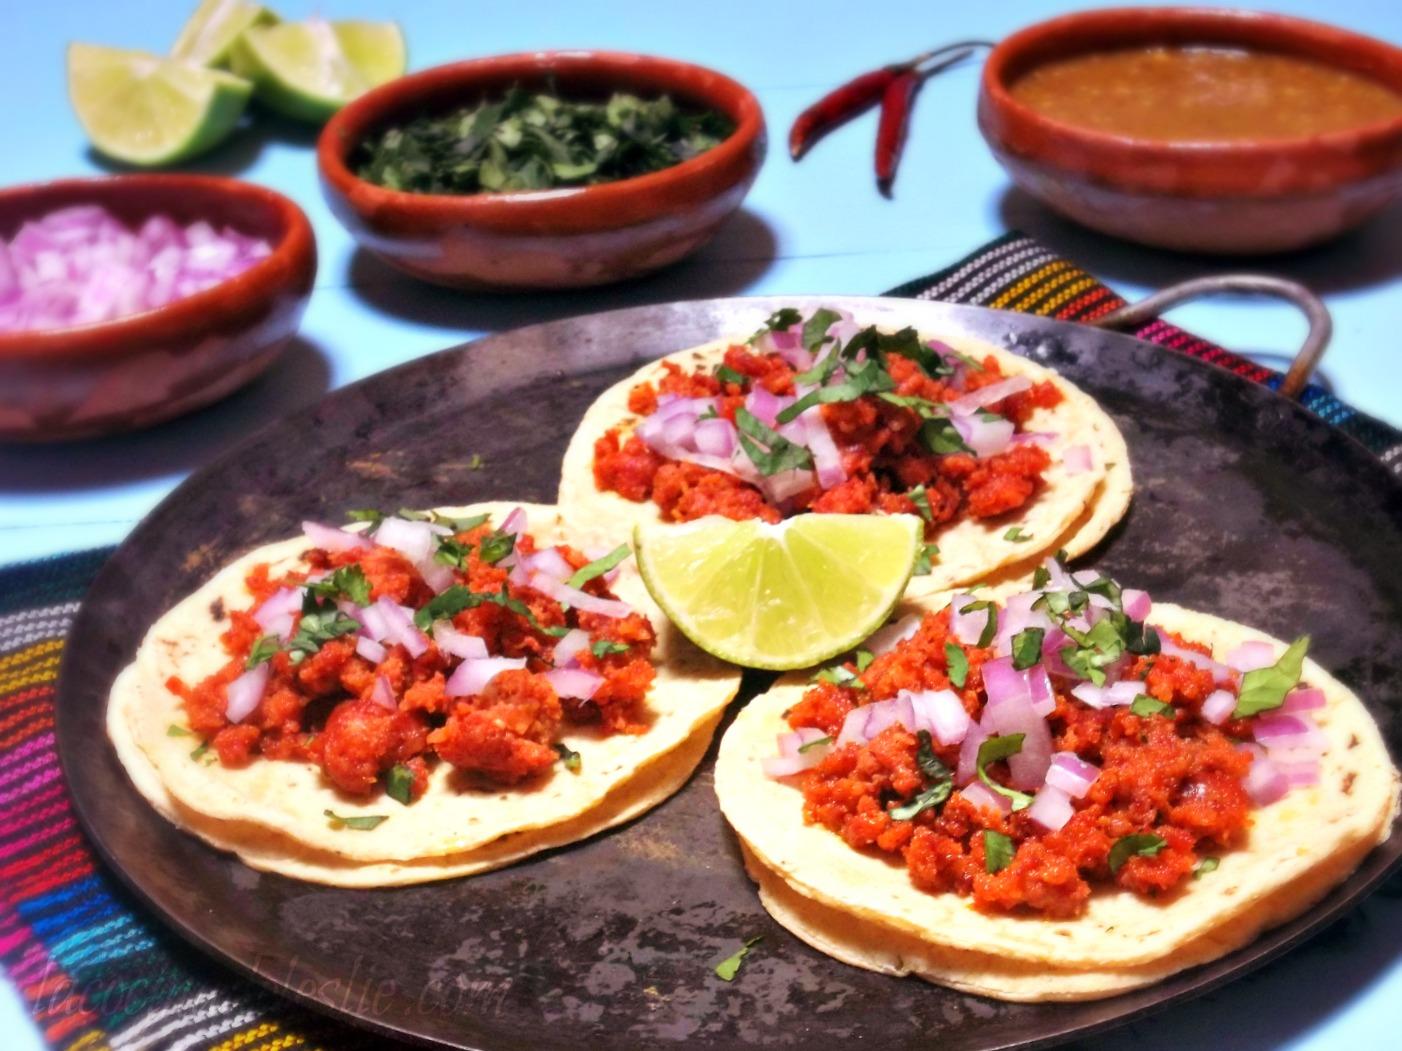 Authentic Mexican Chorizo Tacos - lacocinadeleslie.com